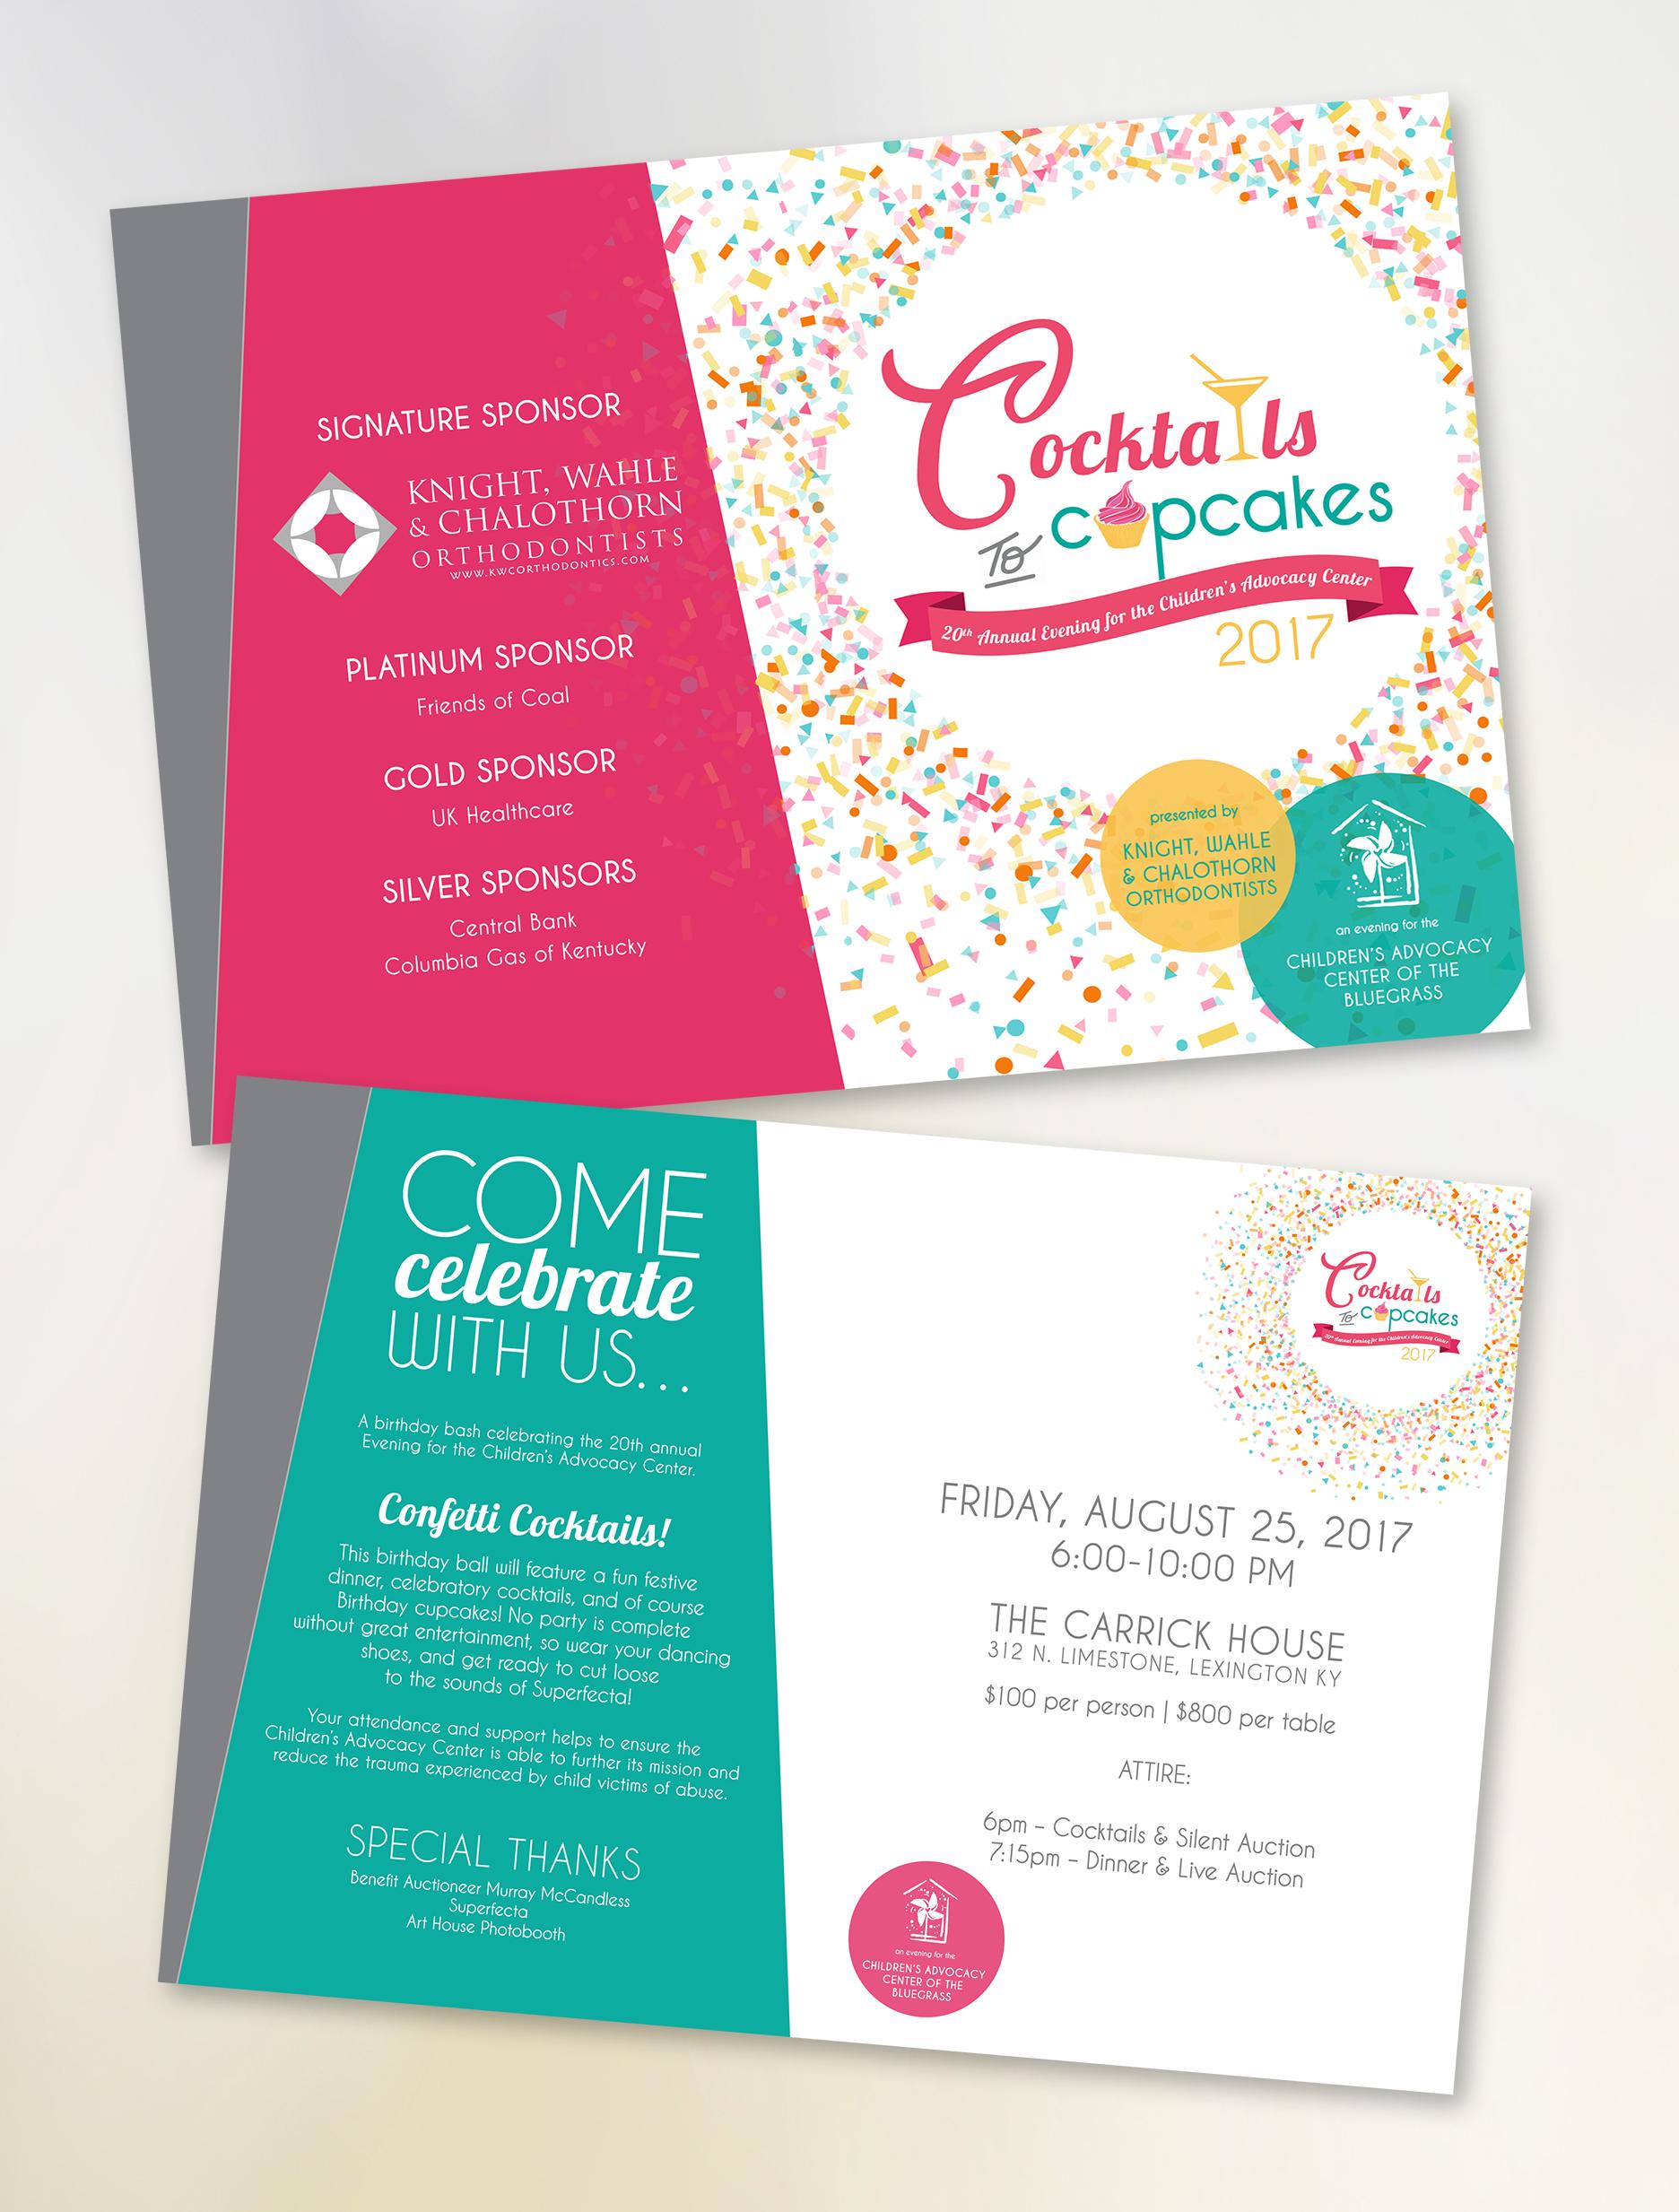 CAC – 2017 invite